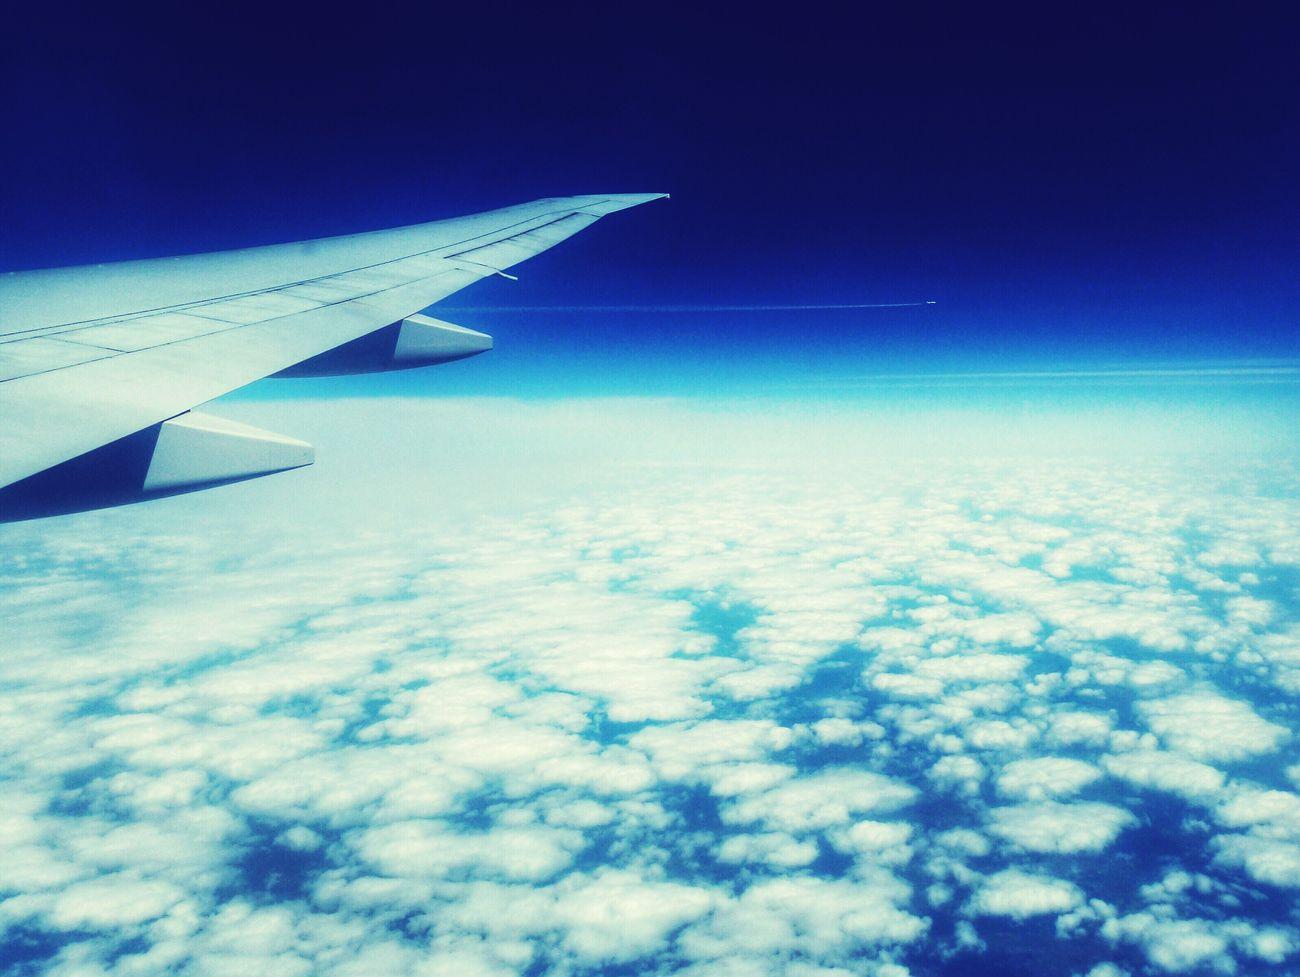 Emirates Sky Fly Slovakia Aeroplane Boeing 777 Blue Sky